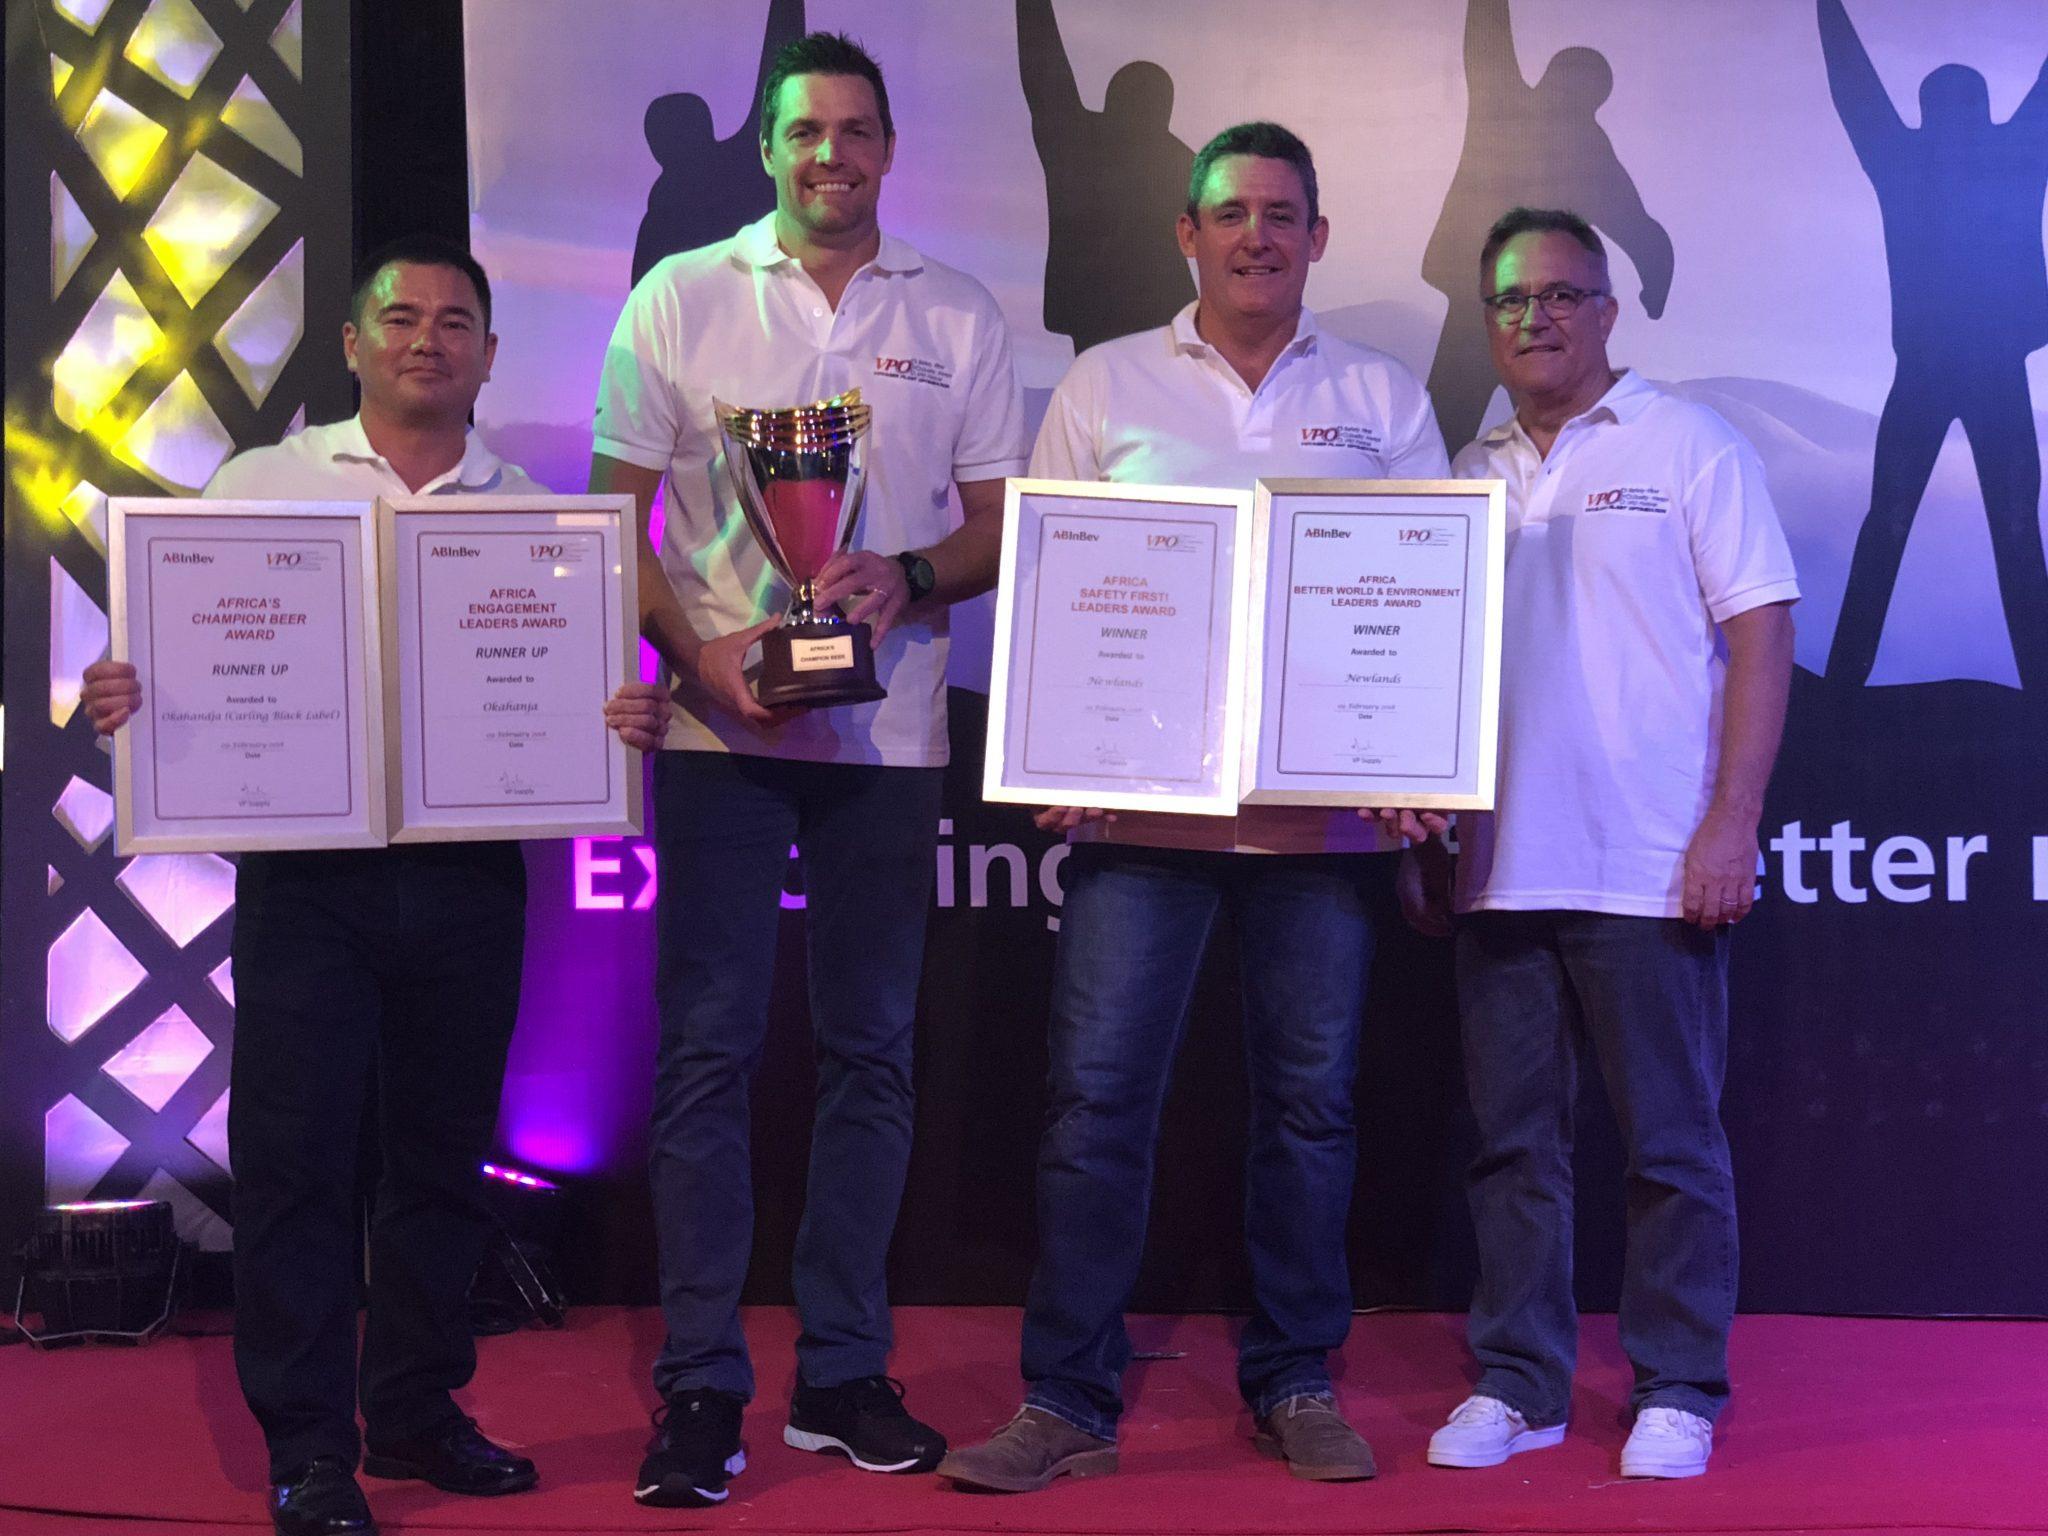 Ab Inbev Wins Prestigious Brewery Awards photo